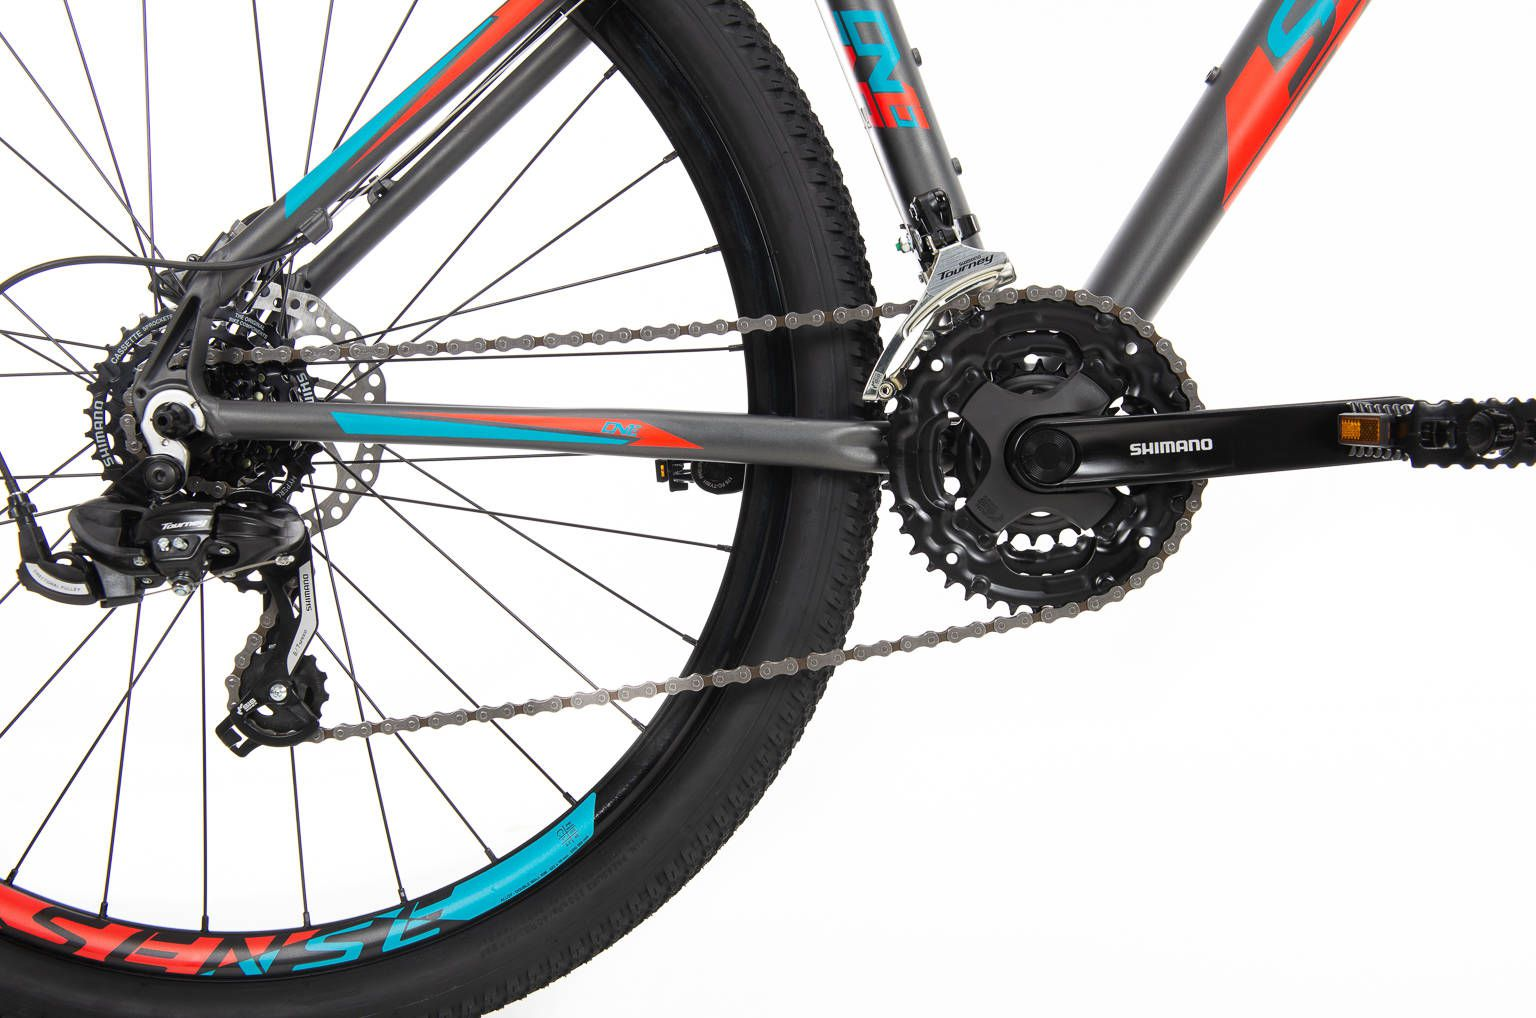 Bicicleta Sense One  2020 Aqua/Cinza  Freio óleo +brinde